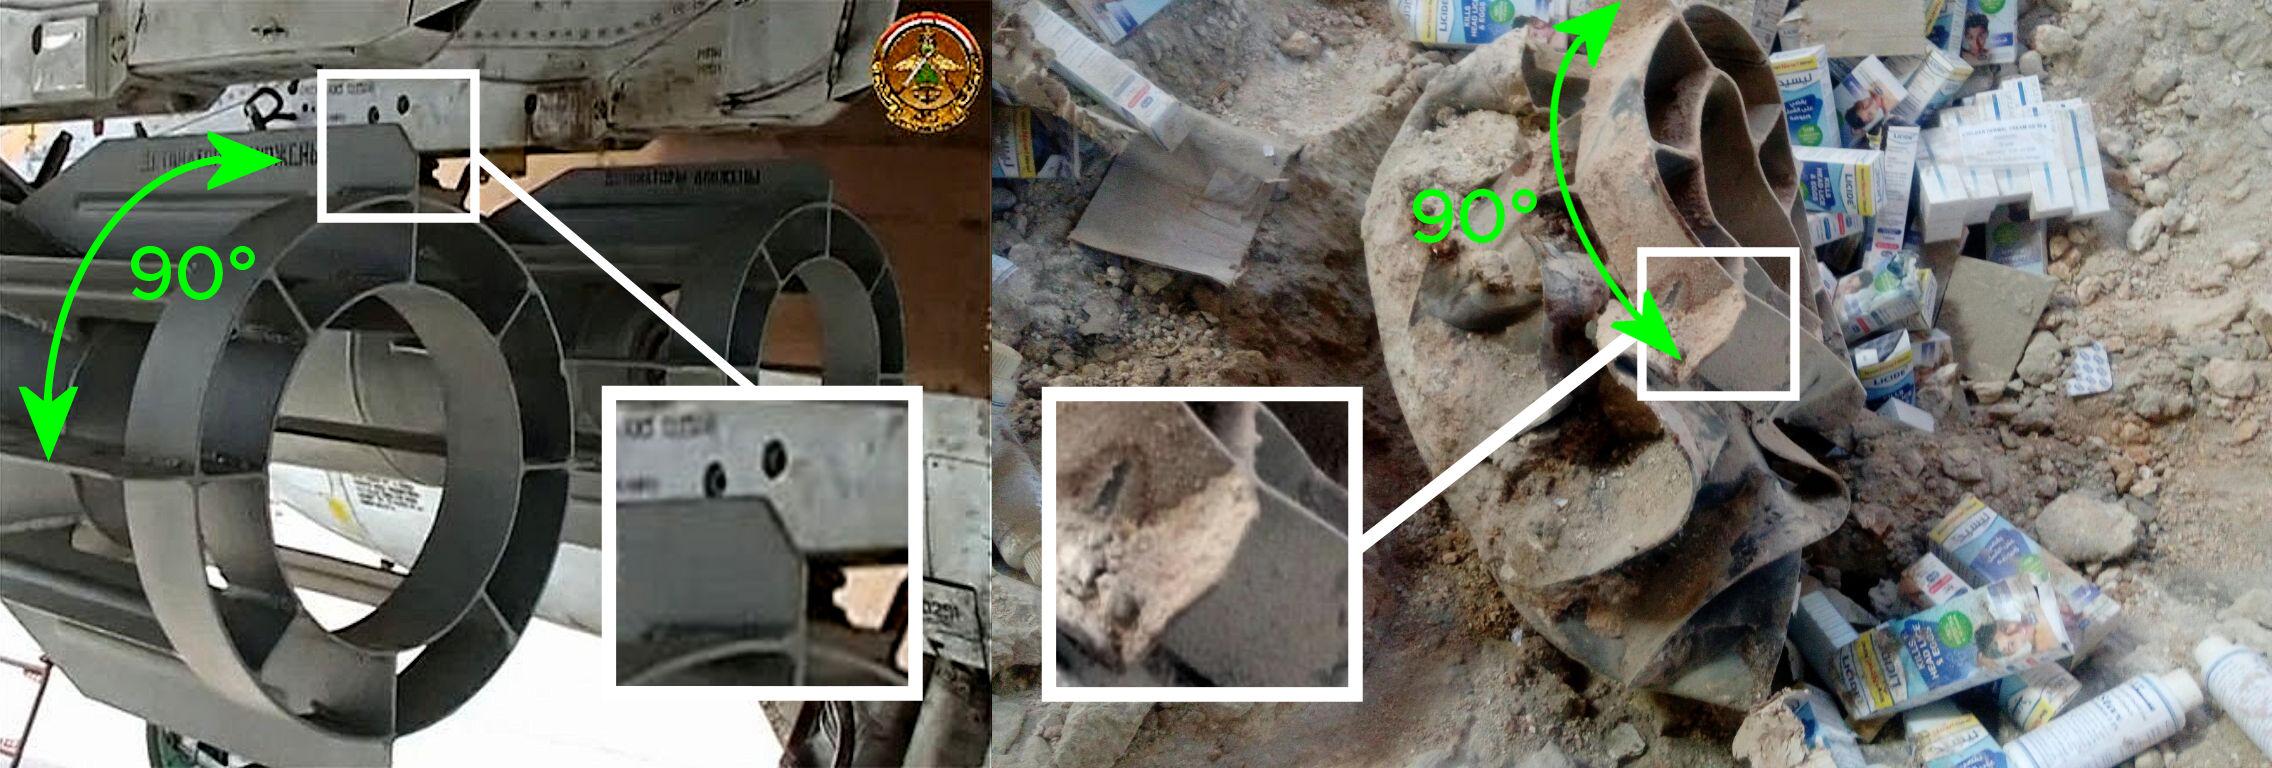 syria aid convoy bomb2 1